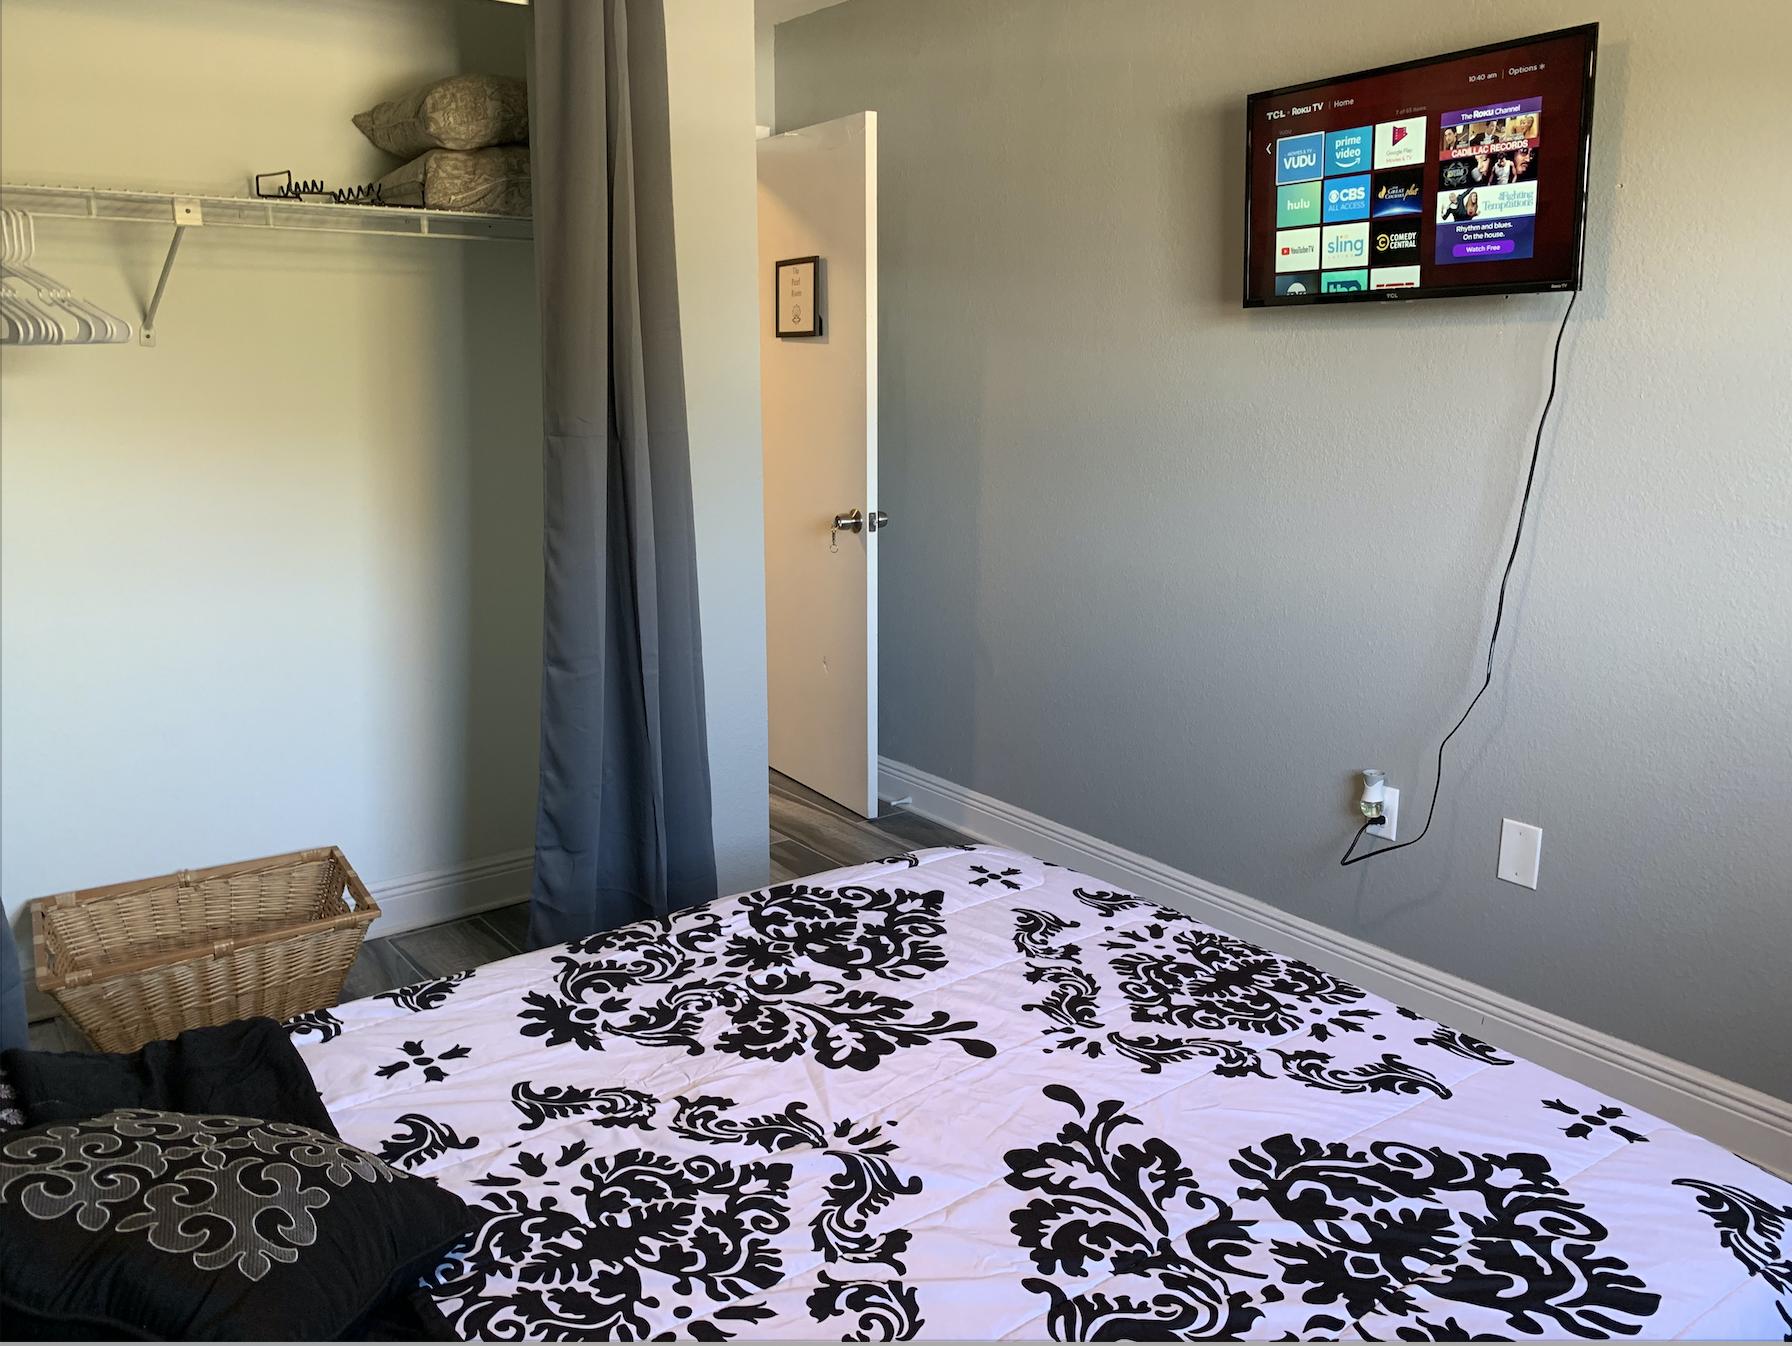 Apartment 3 Bedroom House photo 16947324